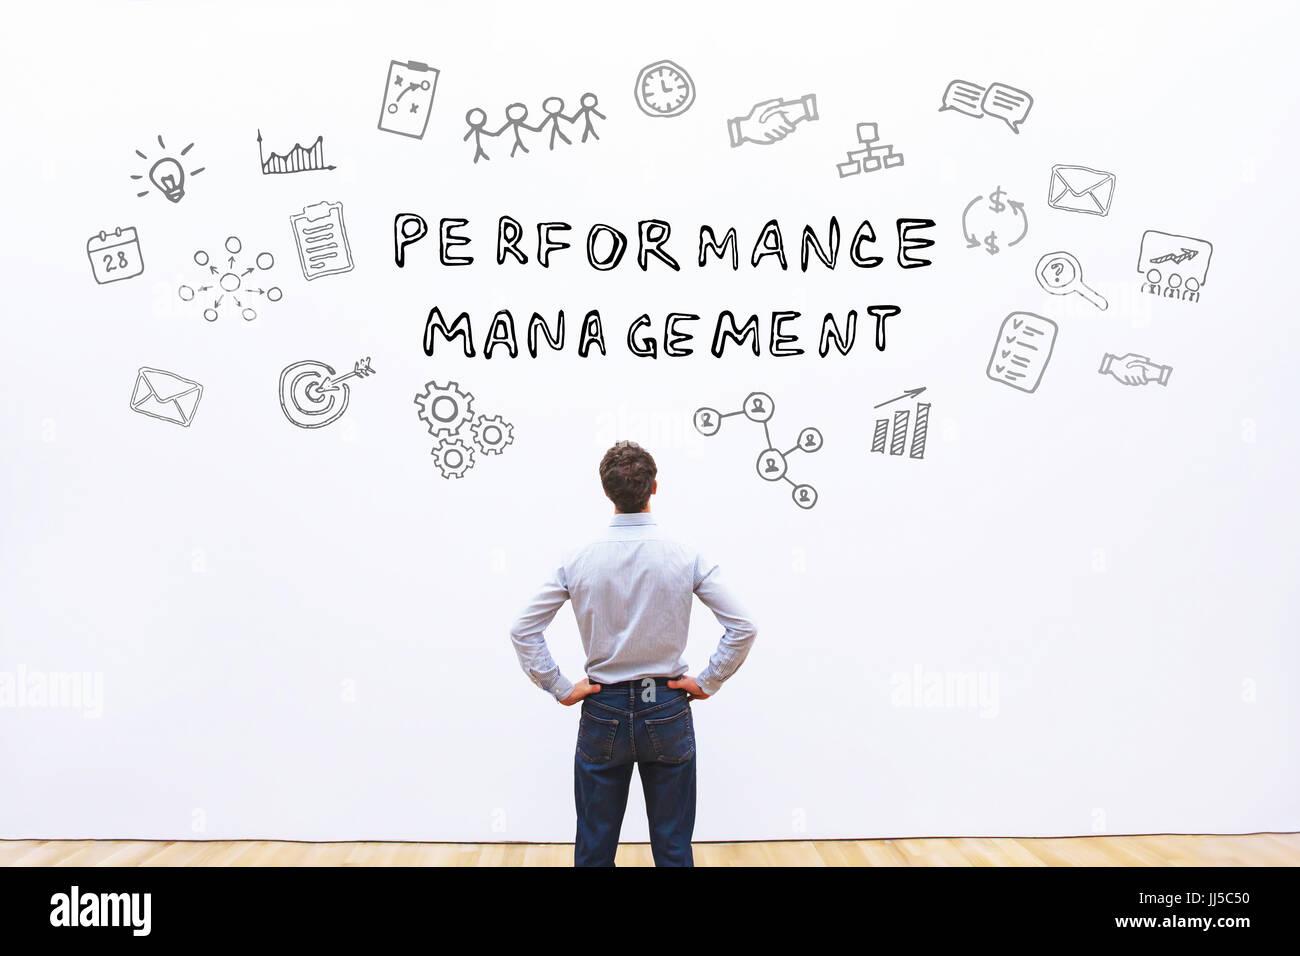 performance management concept - Stock Image